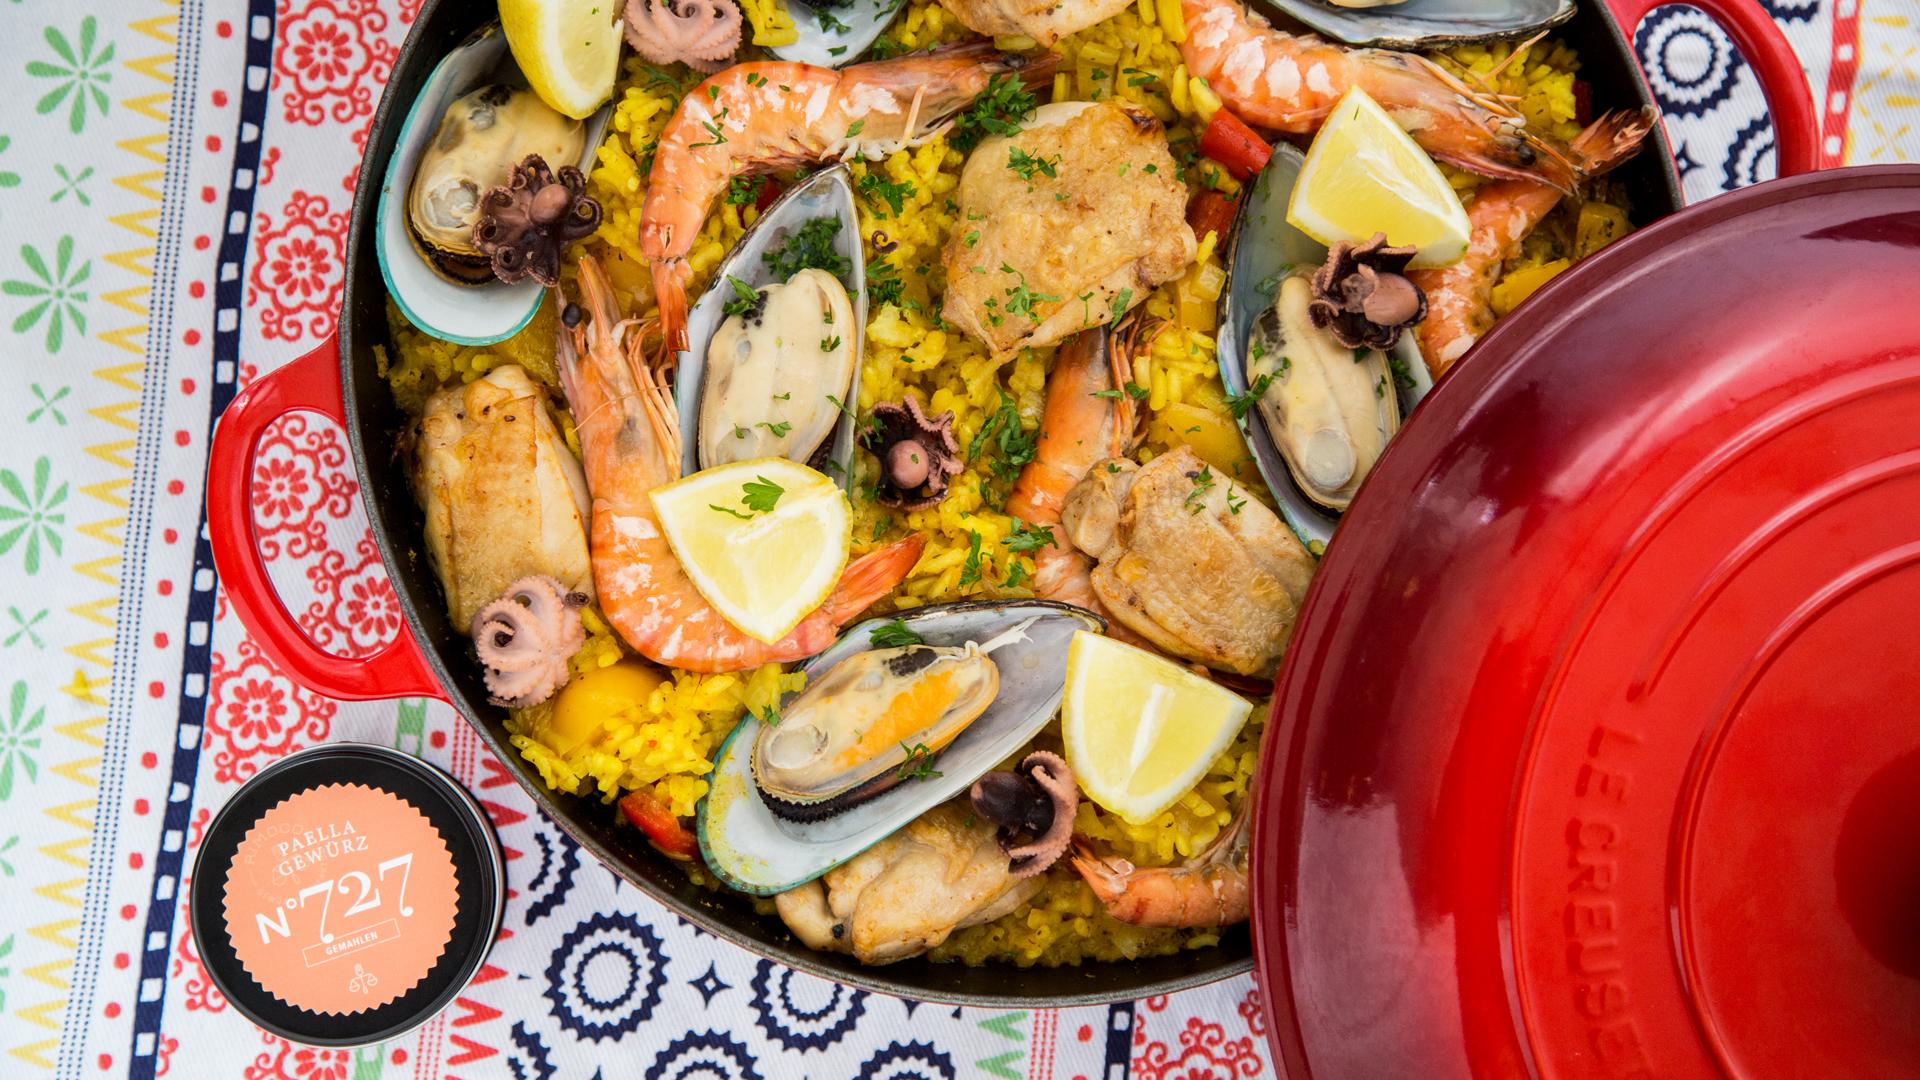 paella-rezept-bio-paella-gewuerzmischung-rimoco-16x9